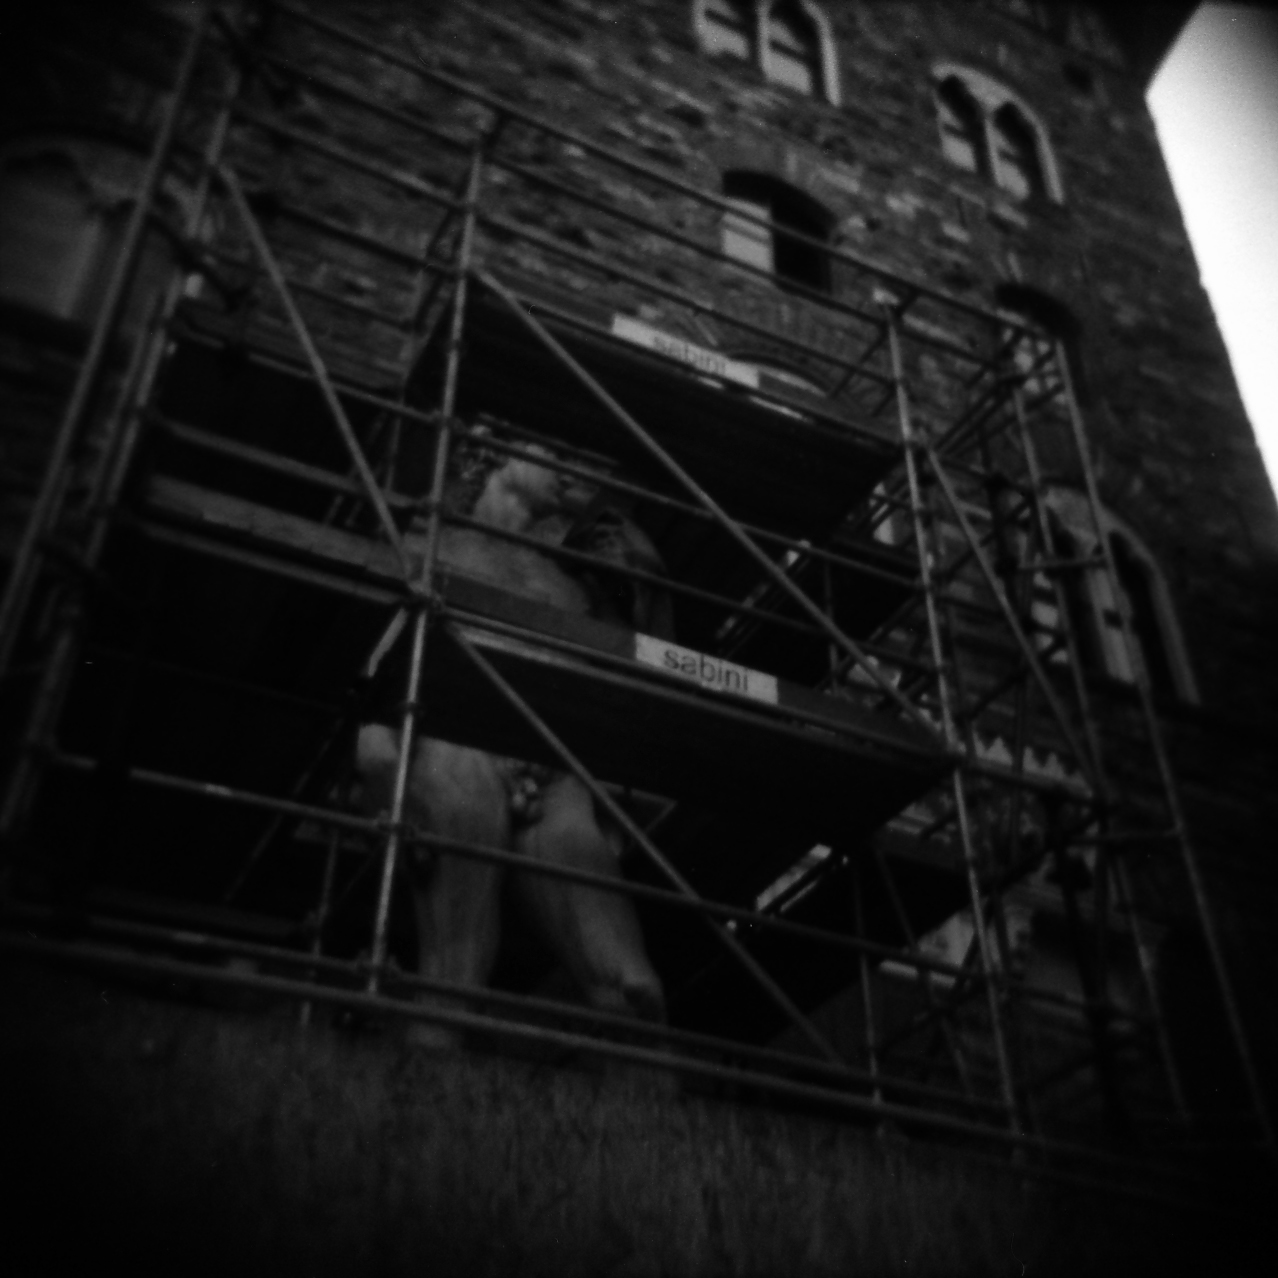 statue scaffold.jpg